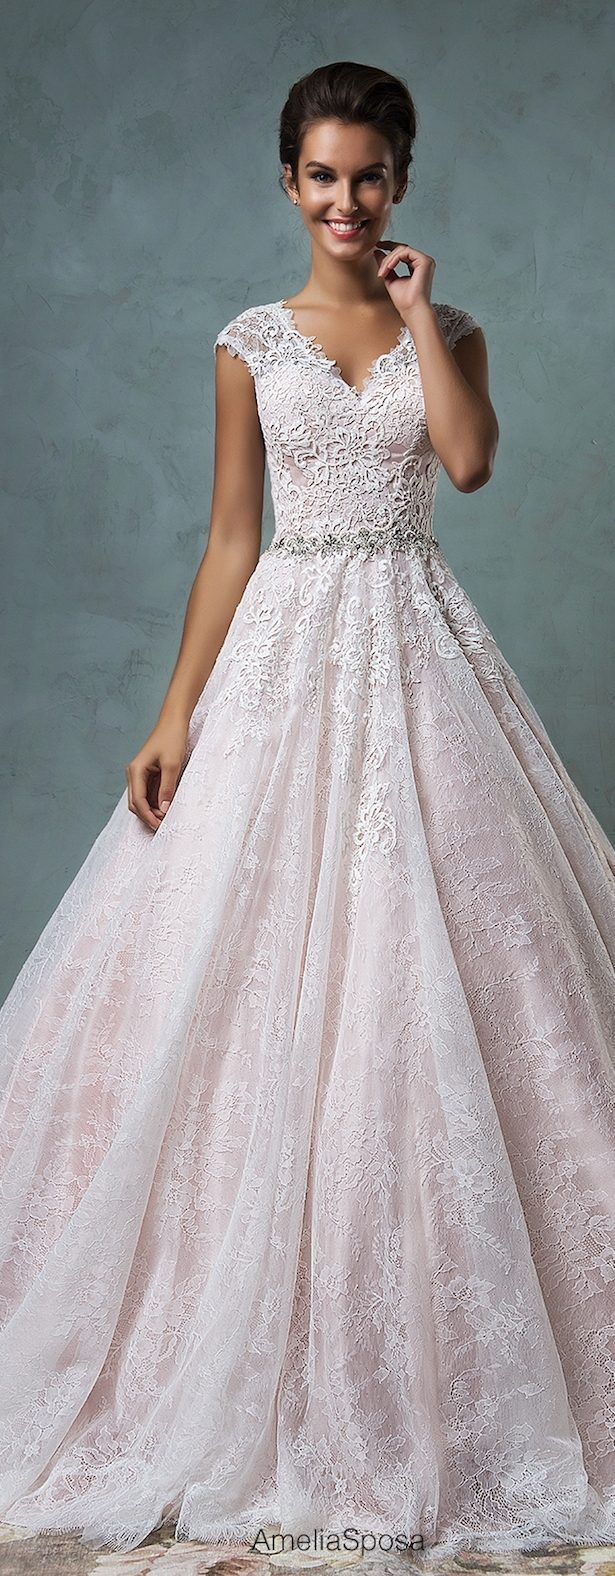 Amelia Sposa 2016 Wedding Dress   Belle The Magazine